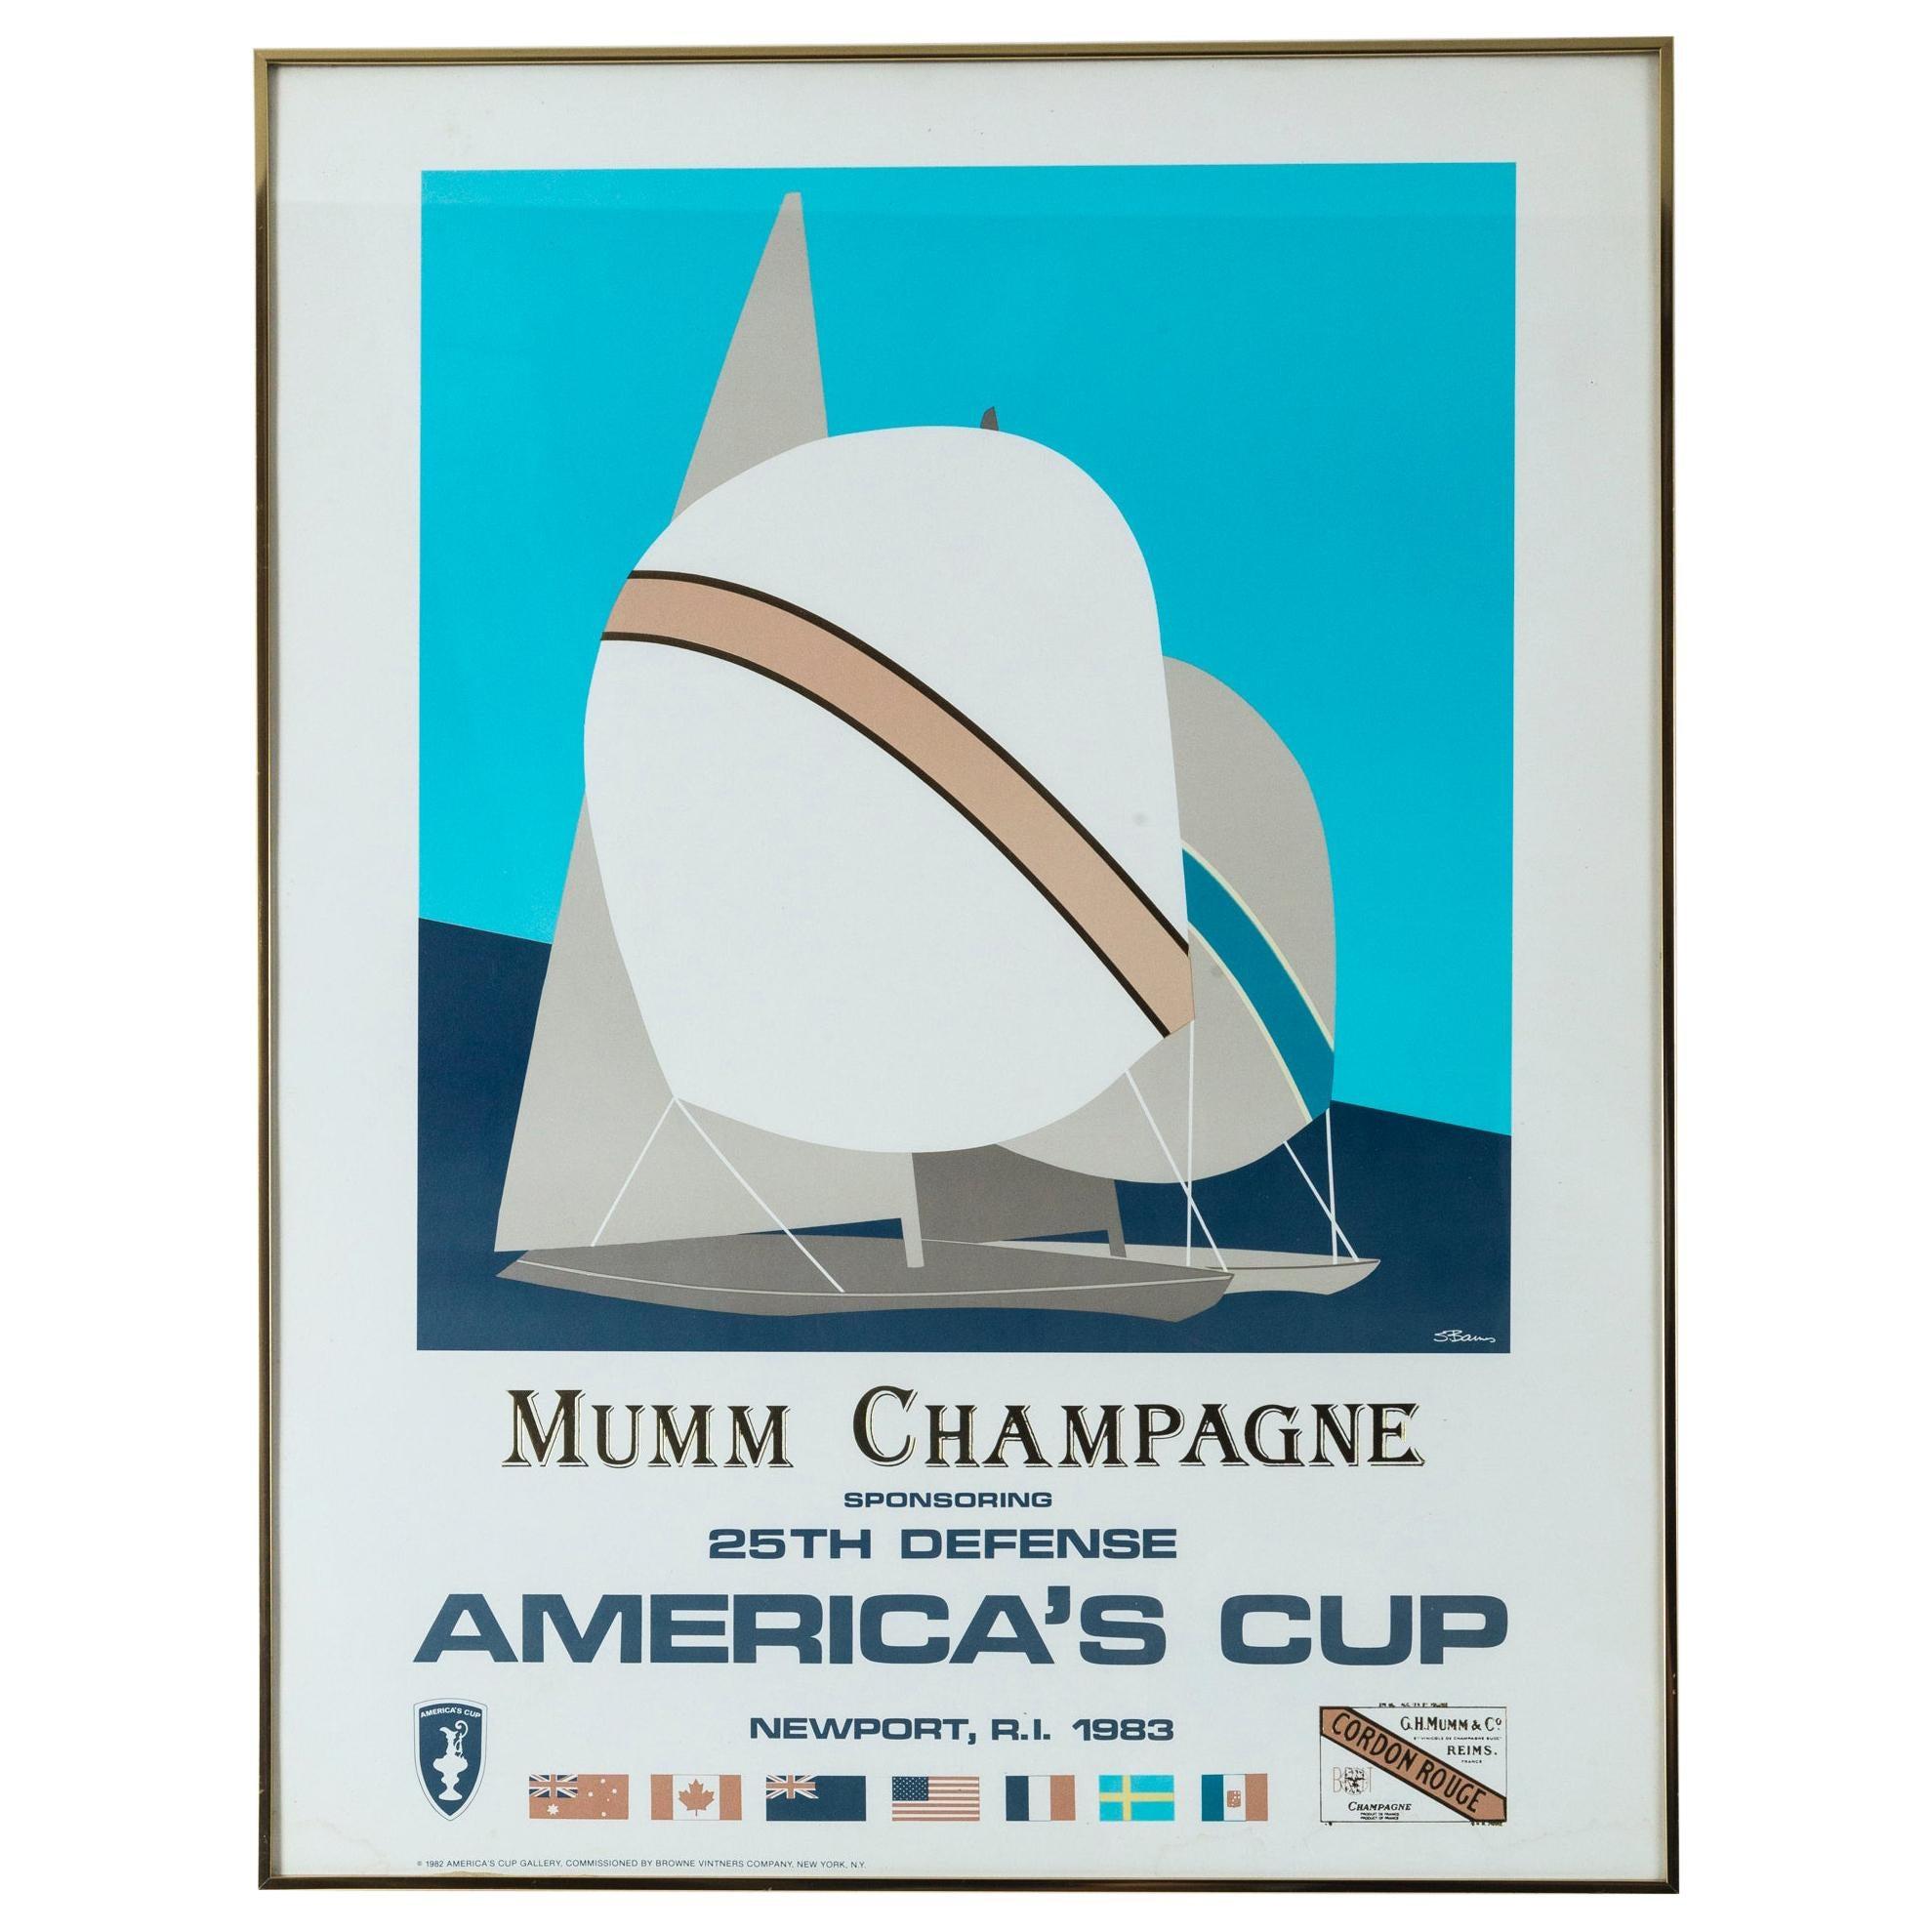 Mumm Champagne America's Cup Poster, Newport, Rhode Island, 1983